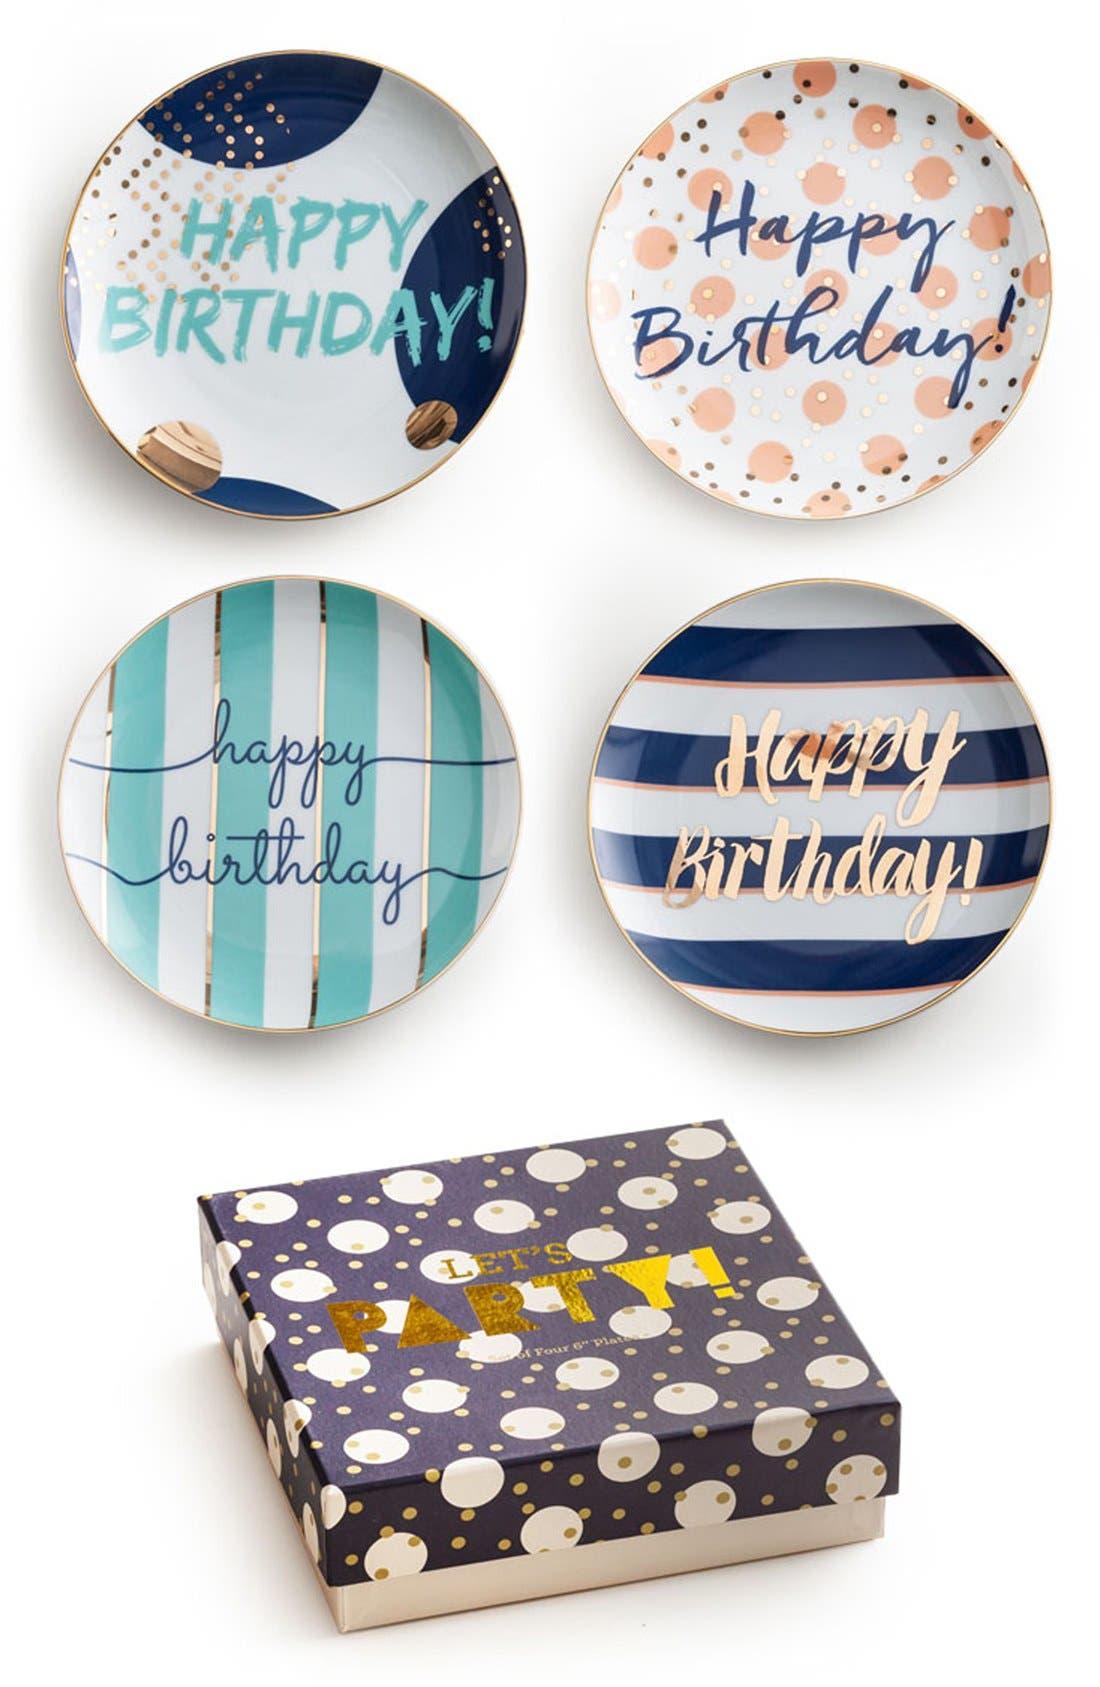 Alternate Image 1 Selected - Rosanna 'Happy Birthday' Porcelain Plates (Set of 4)